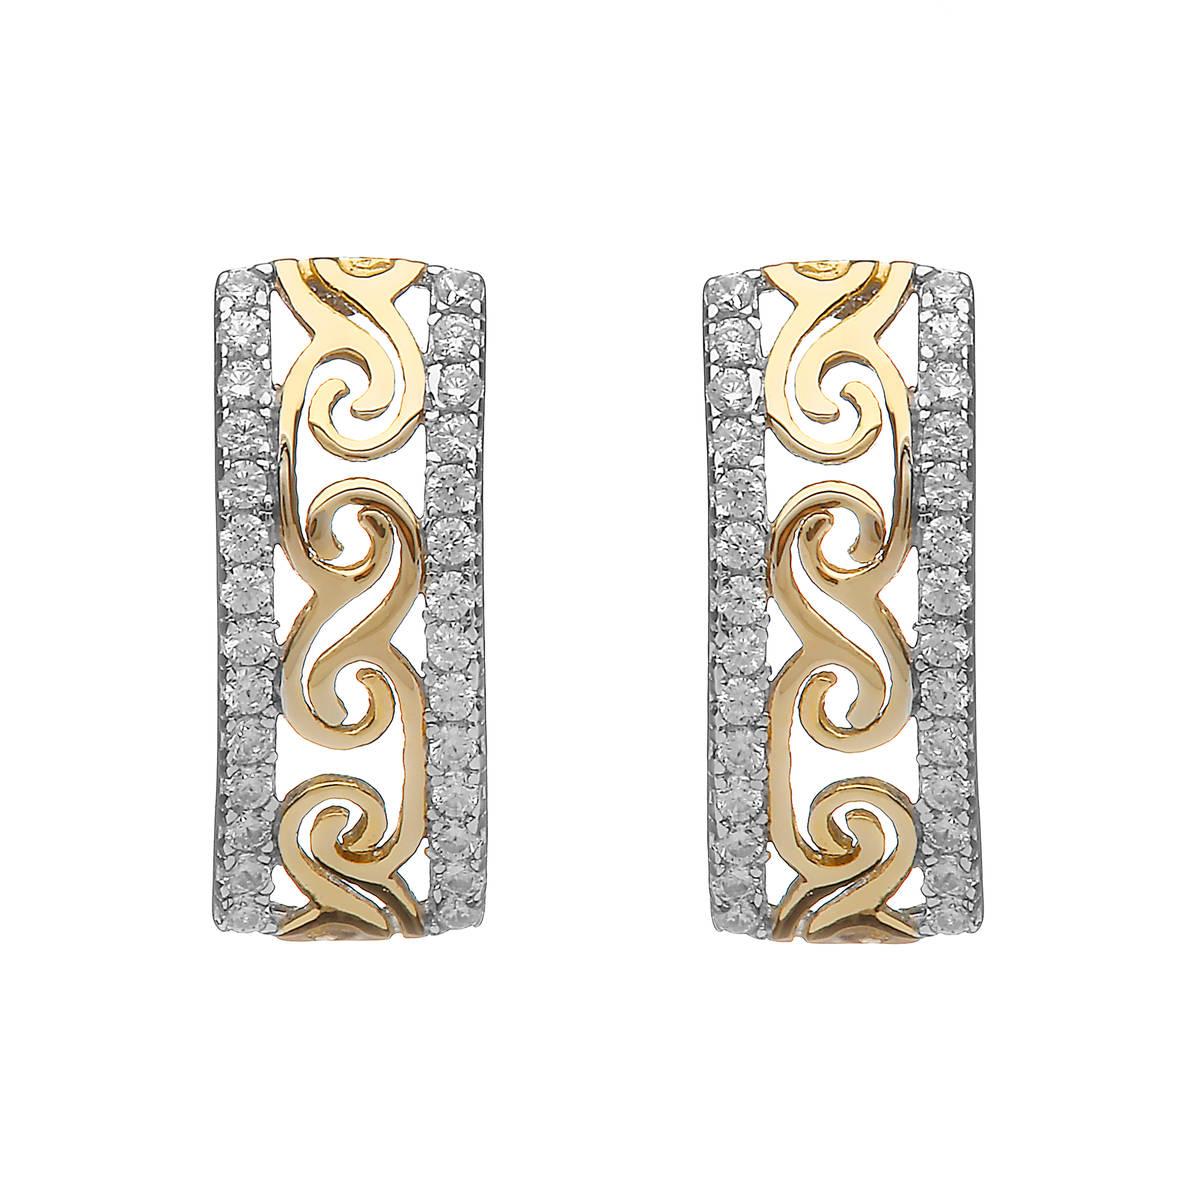 Silver/gp Celtic Huggie Earrings With Cz